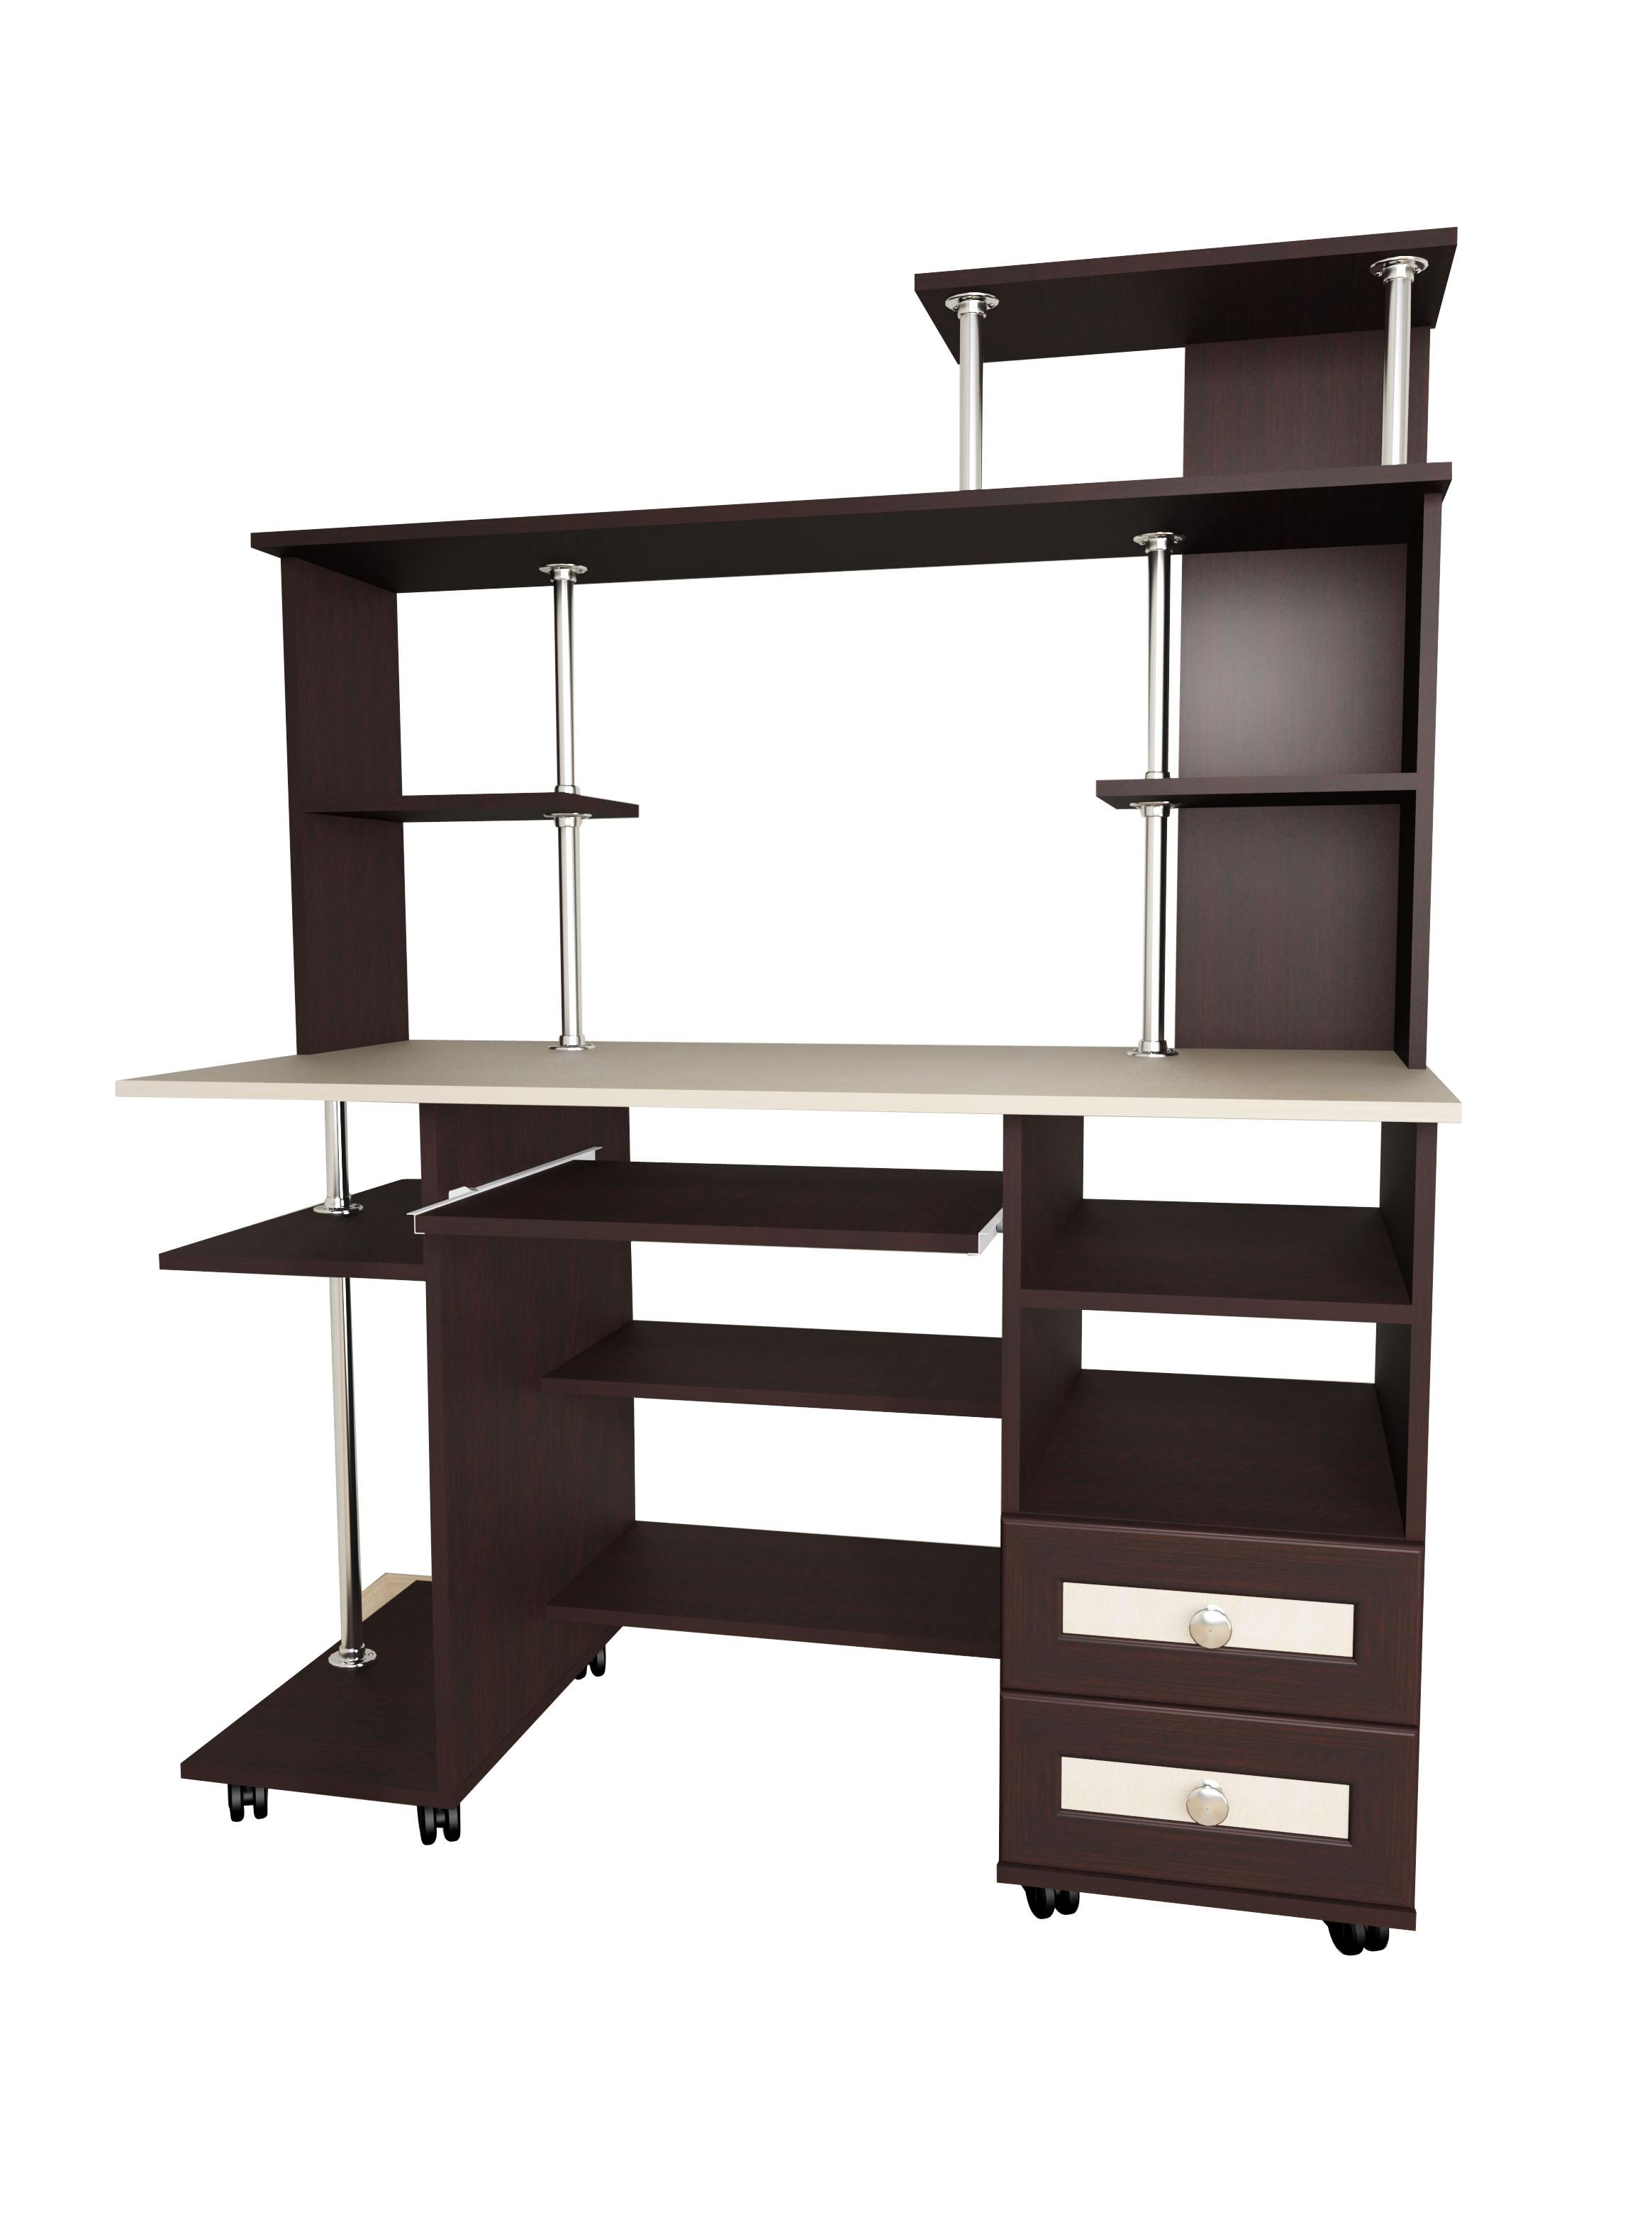 Компьютерный стол Мебелайн-24 стенка мебелайн 5